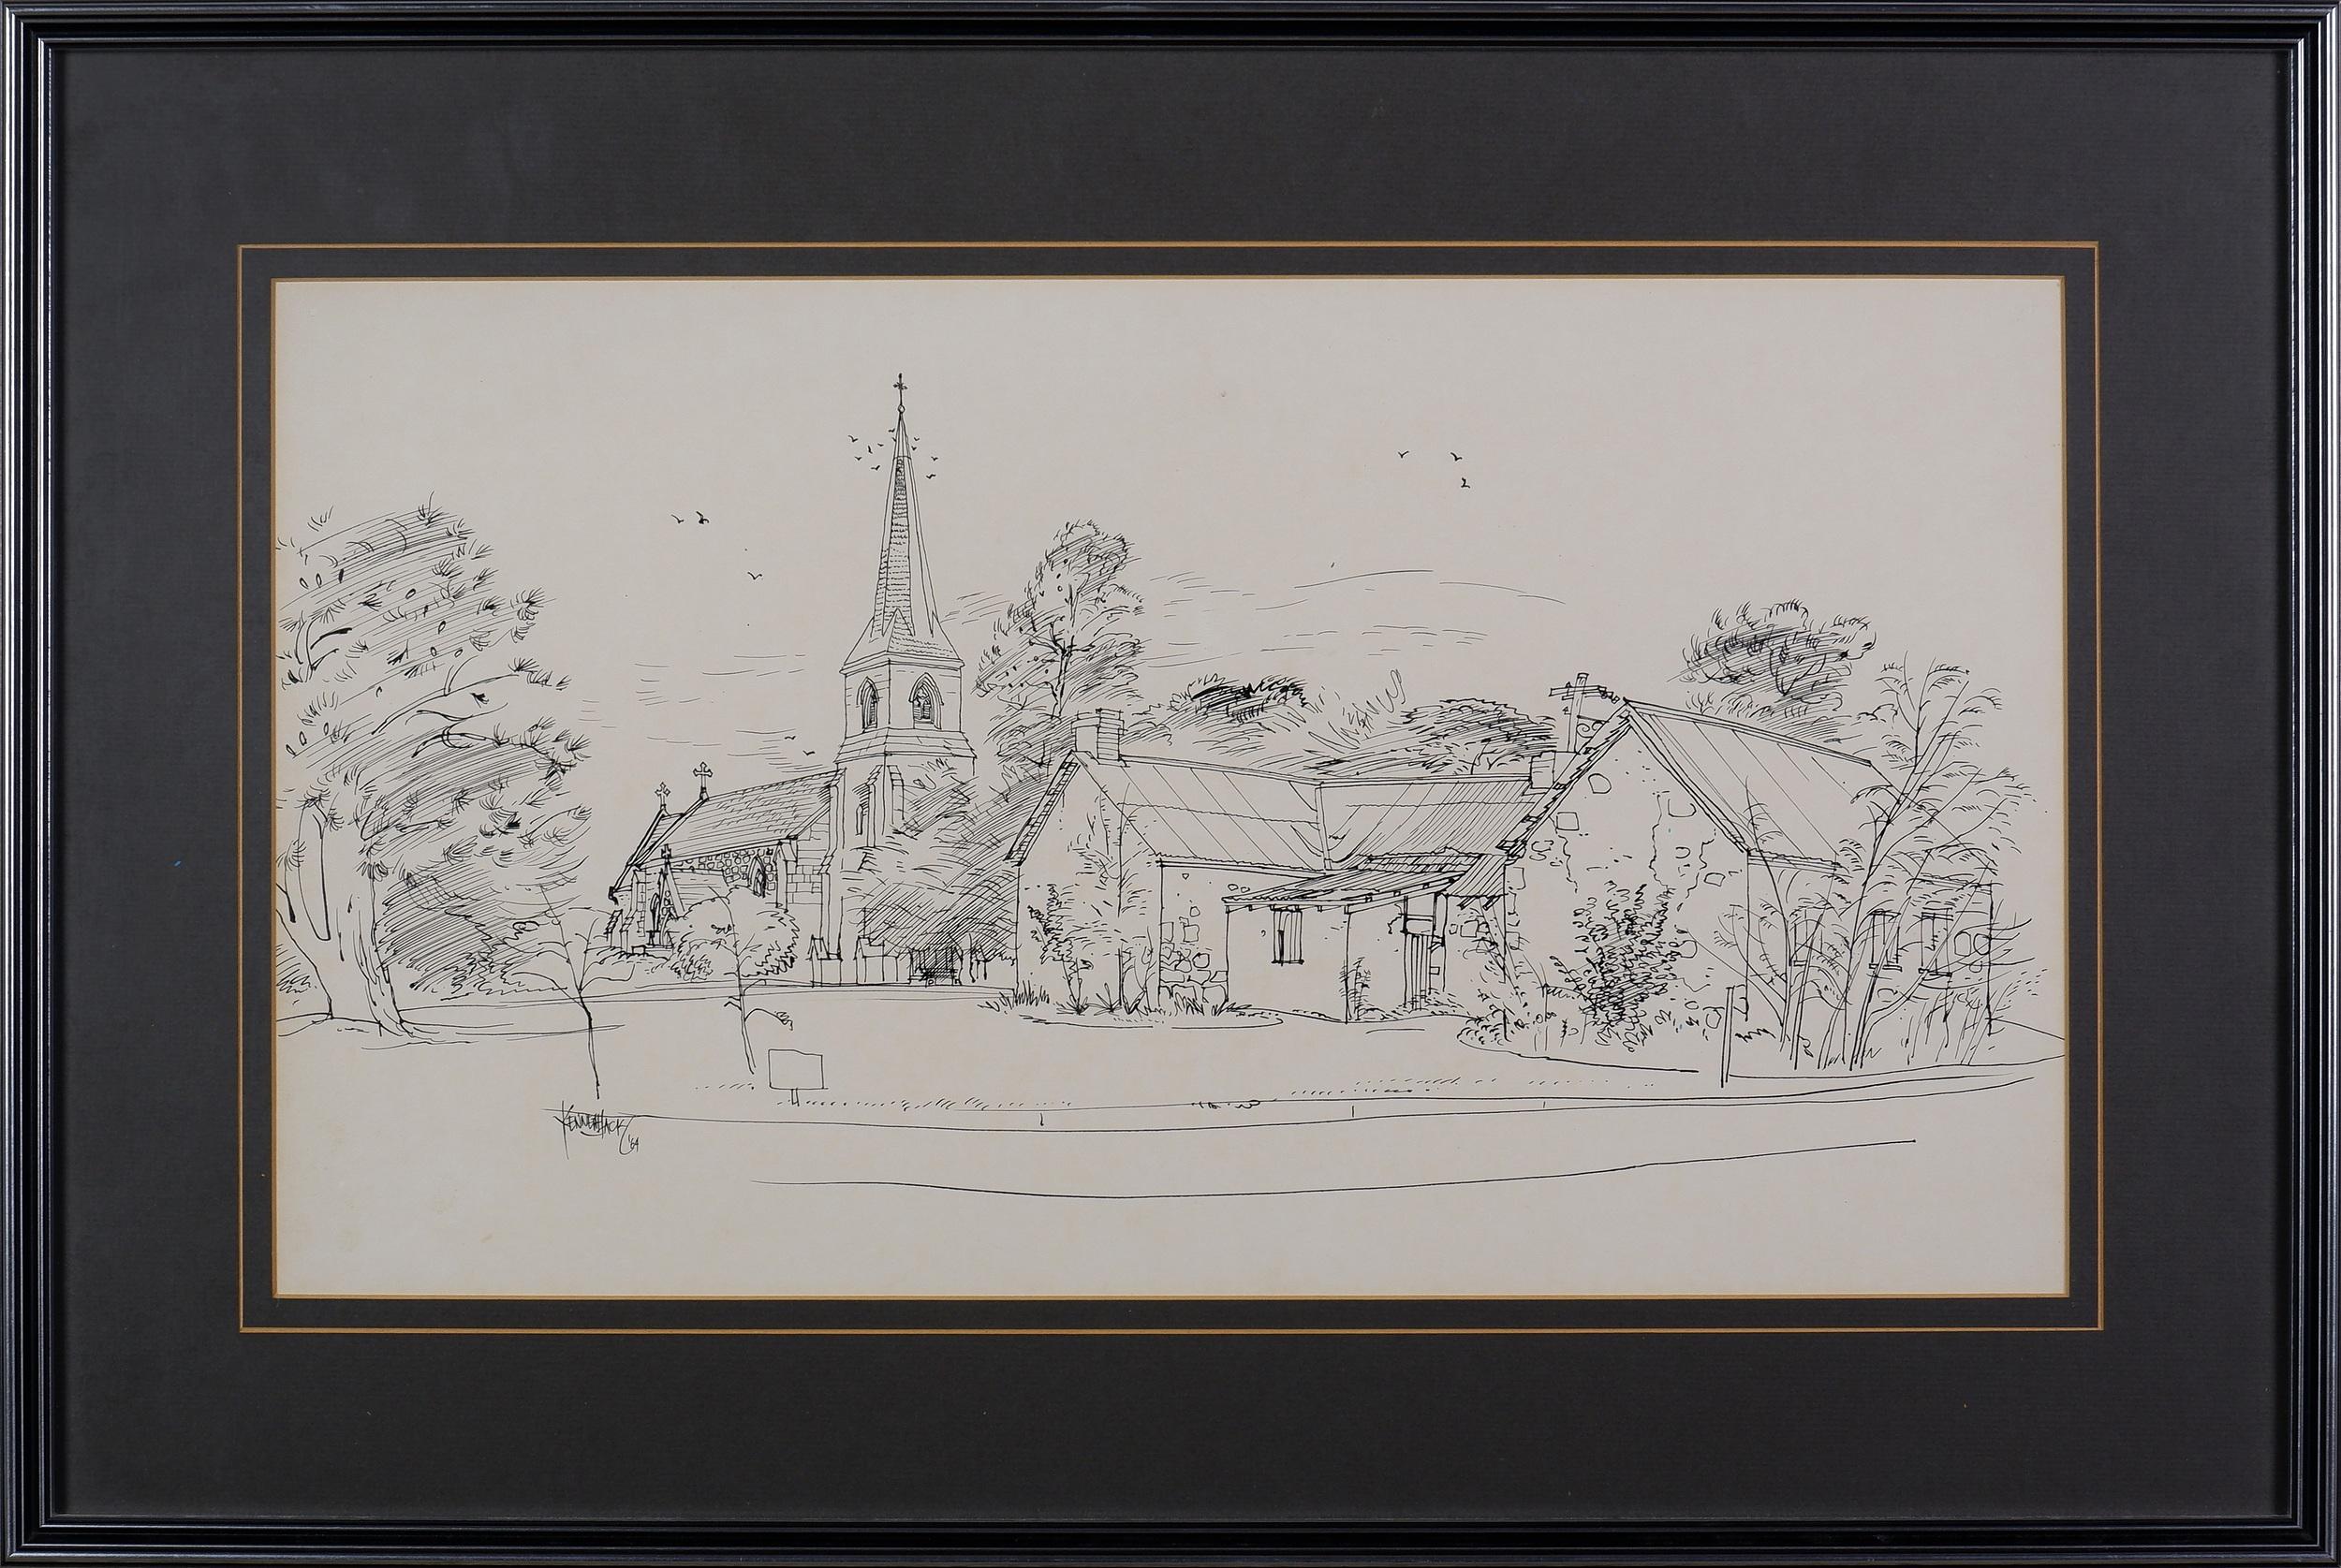 'Kenneth Jack (1924-2006), St Johns Church, Reid 1964, Felt-Tipped Pen on Paper'